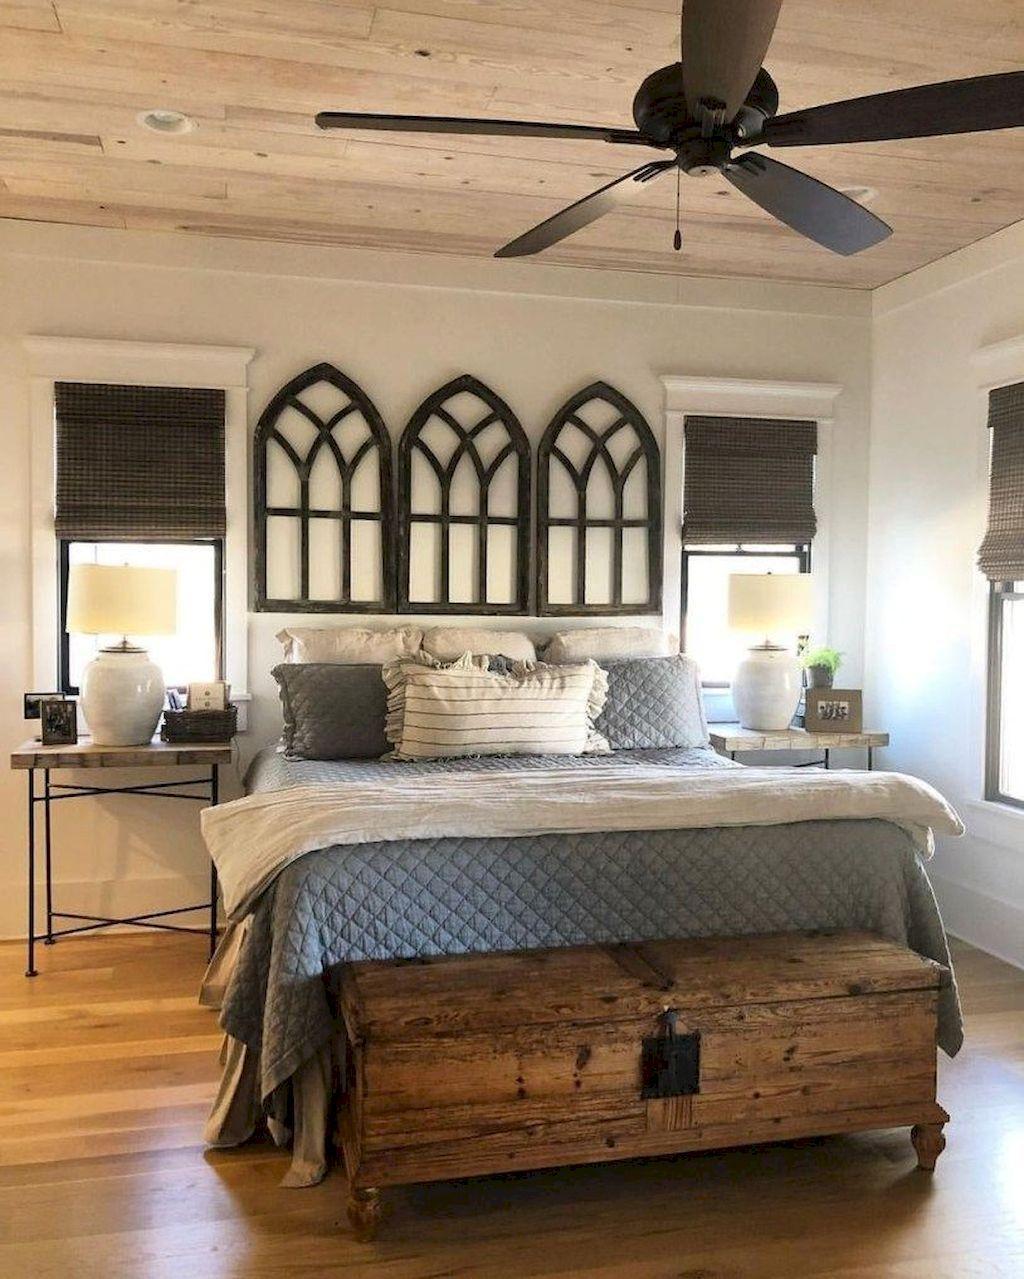 05 Modern Rustic Farmhouse Bedroom Ideas: 85 Rustic Farmhouse Style Master Bedroom Decorating Ideas